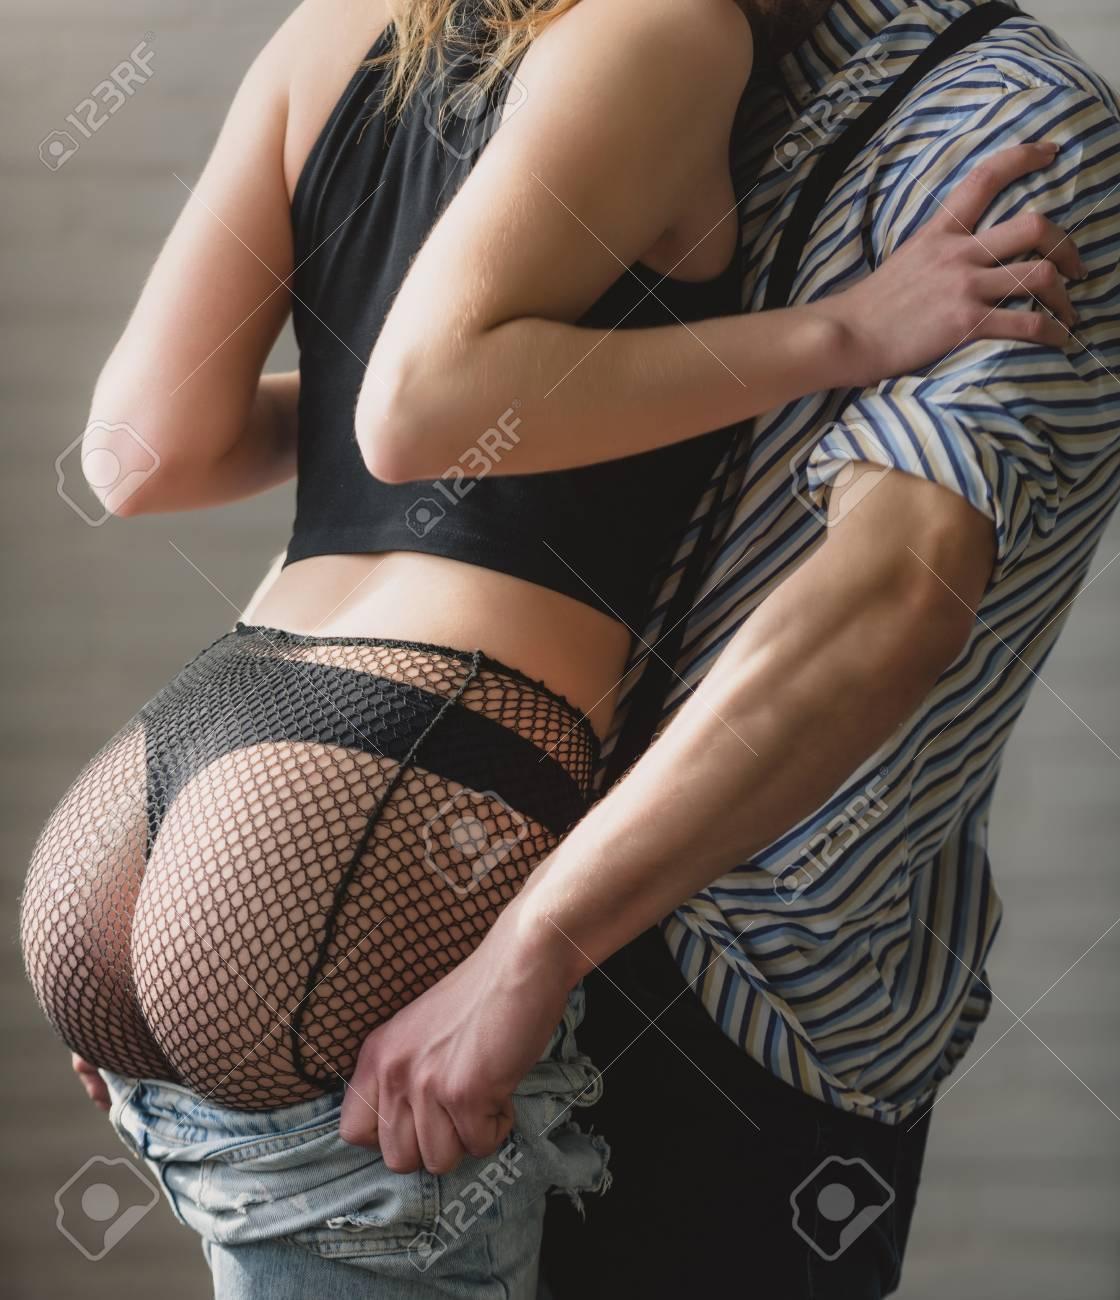 Hottest gif porn image